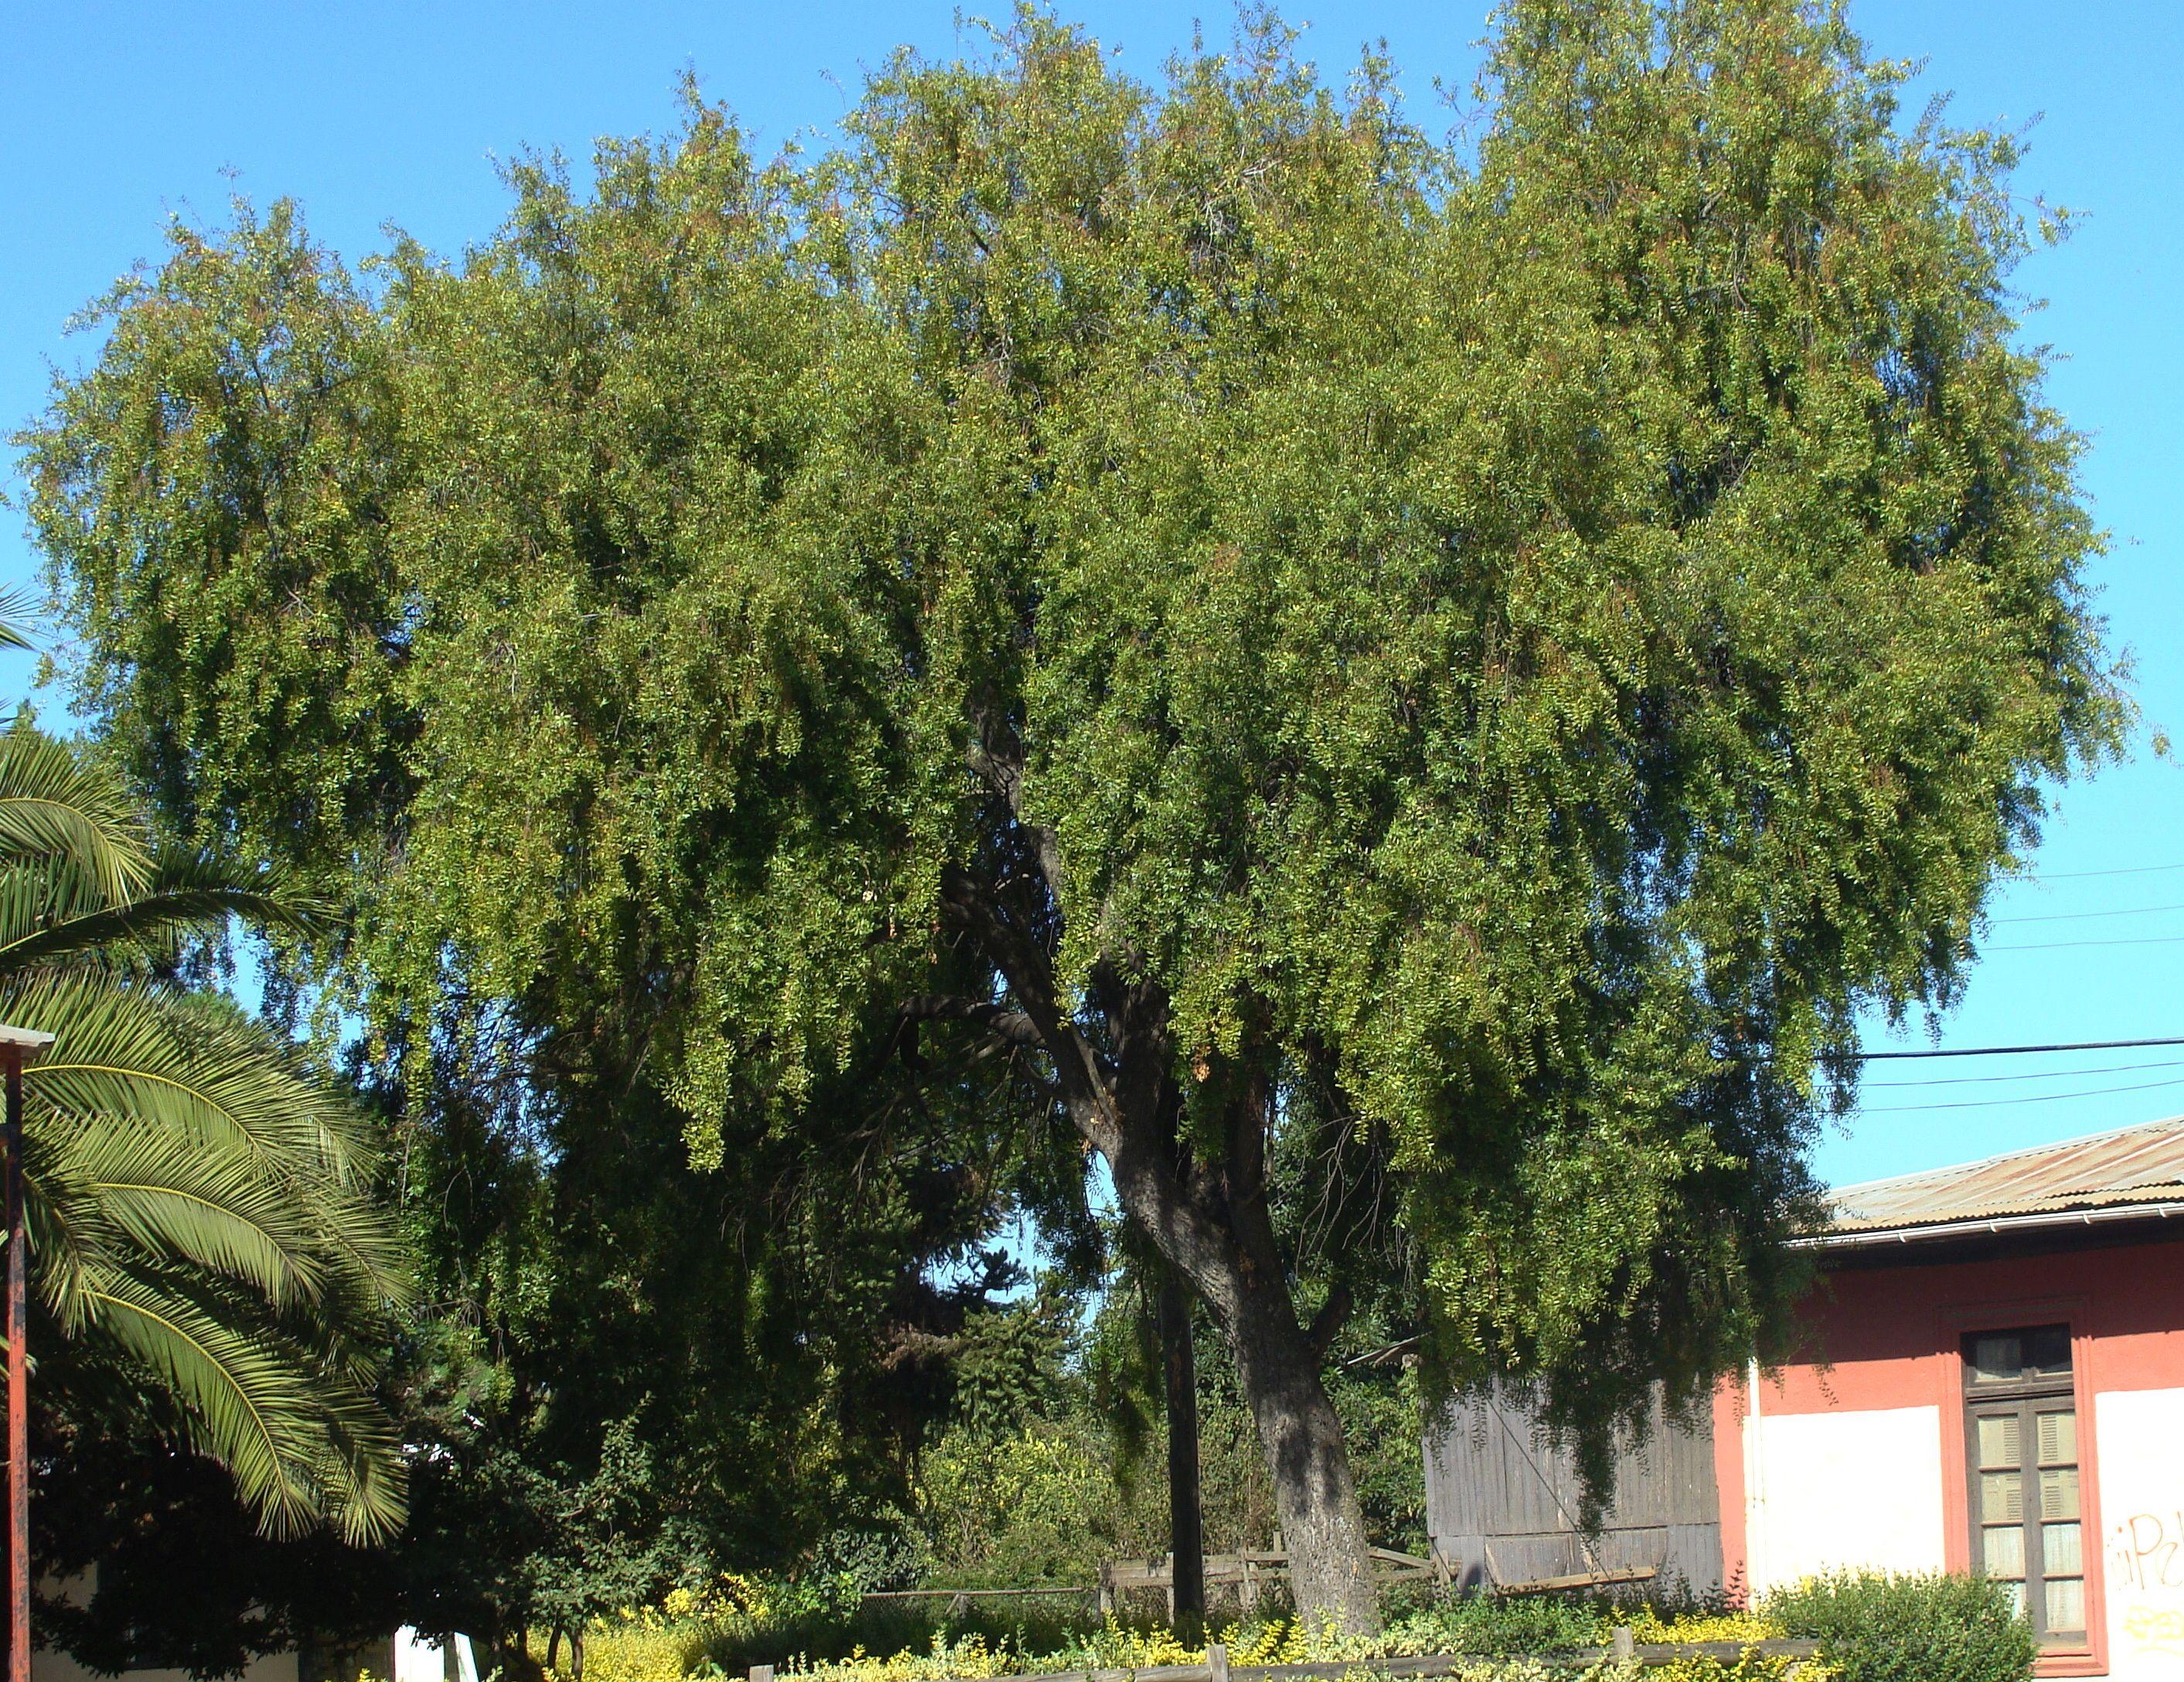 Maiten rboles ornamentales pinterest rboles for Tipos de arbustos ornamentales